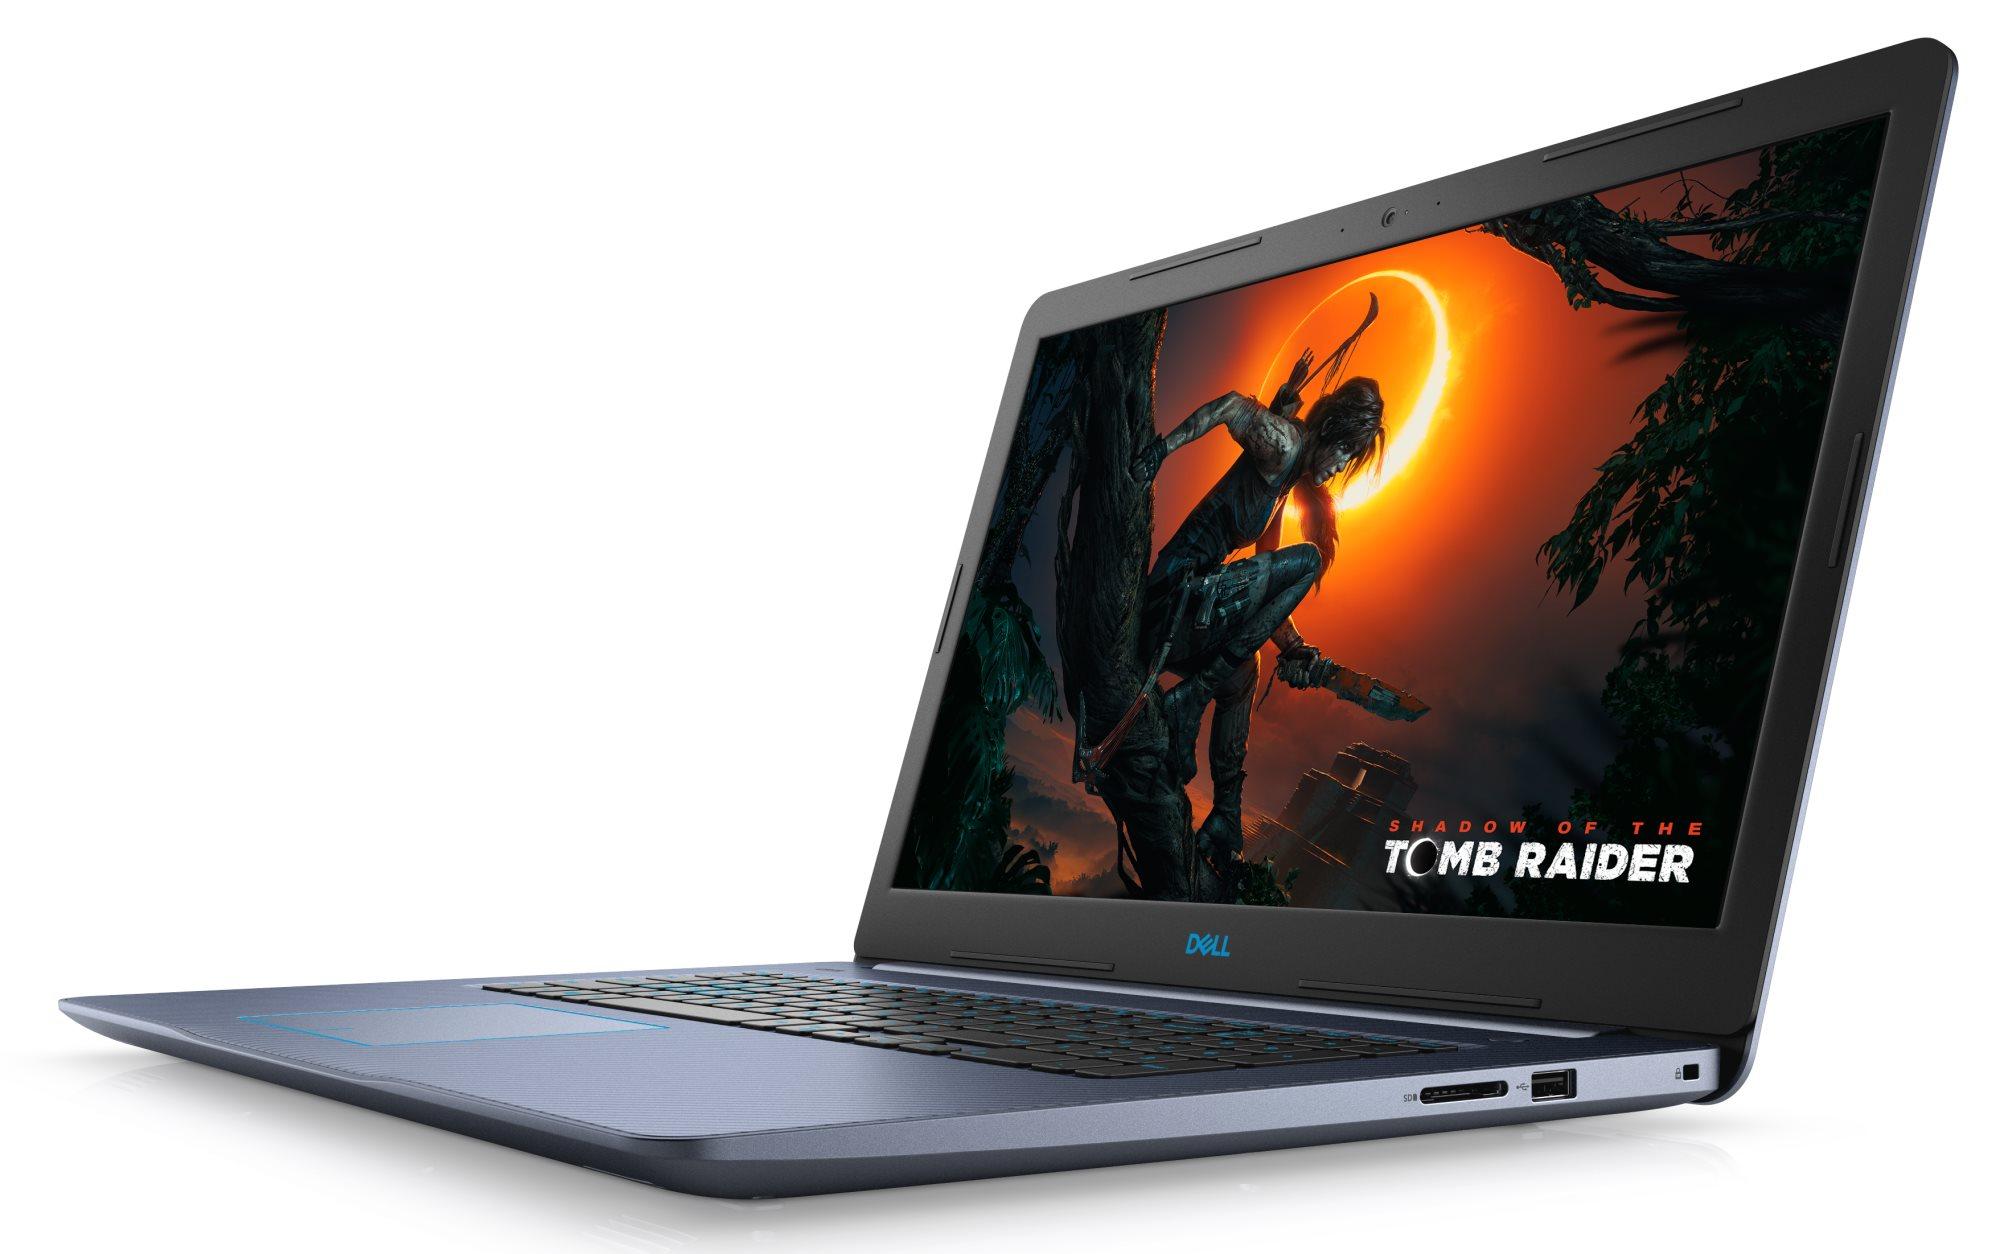 "PC portable 15.6"" full HD Dell G3 15 Gaming - i7-8750H, GTX-1060 (6 Go), 8 Go de RAM, 1 To + 128 Go en SSD, coloris au Choix"